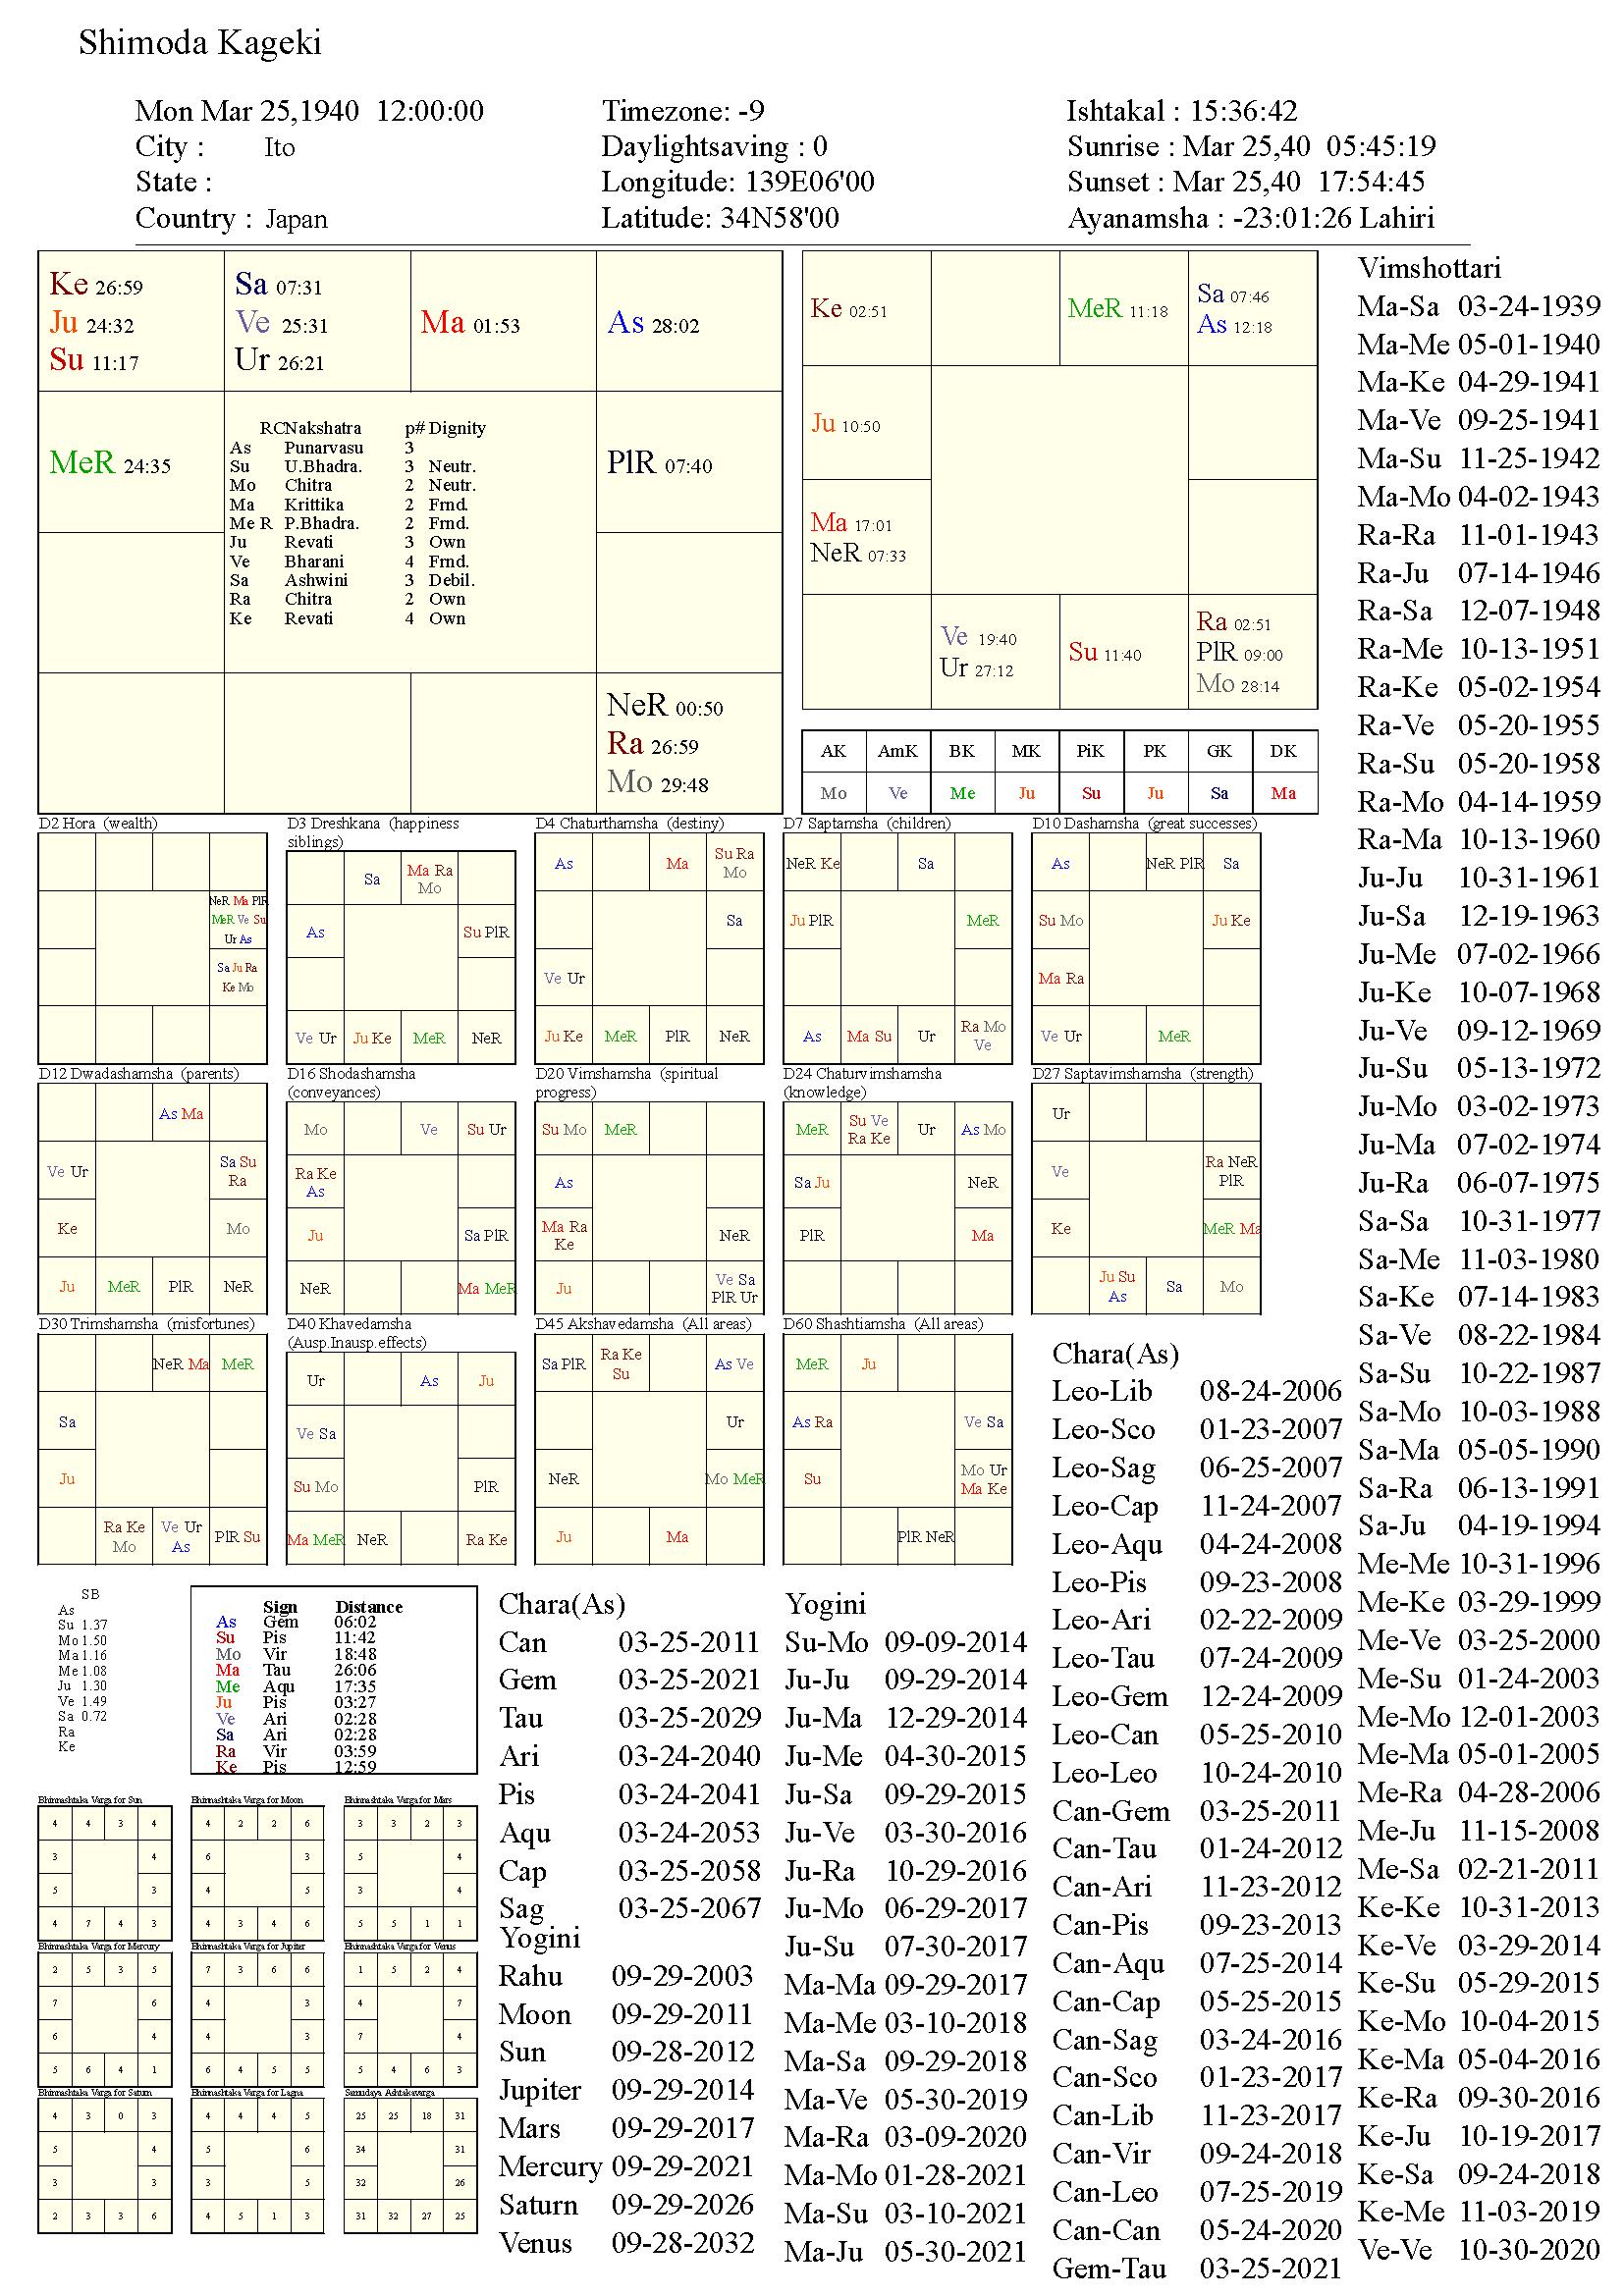 shimodakageki_chart